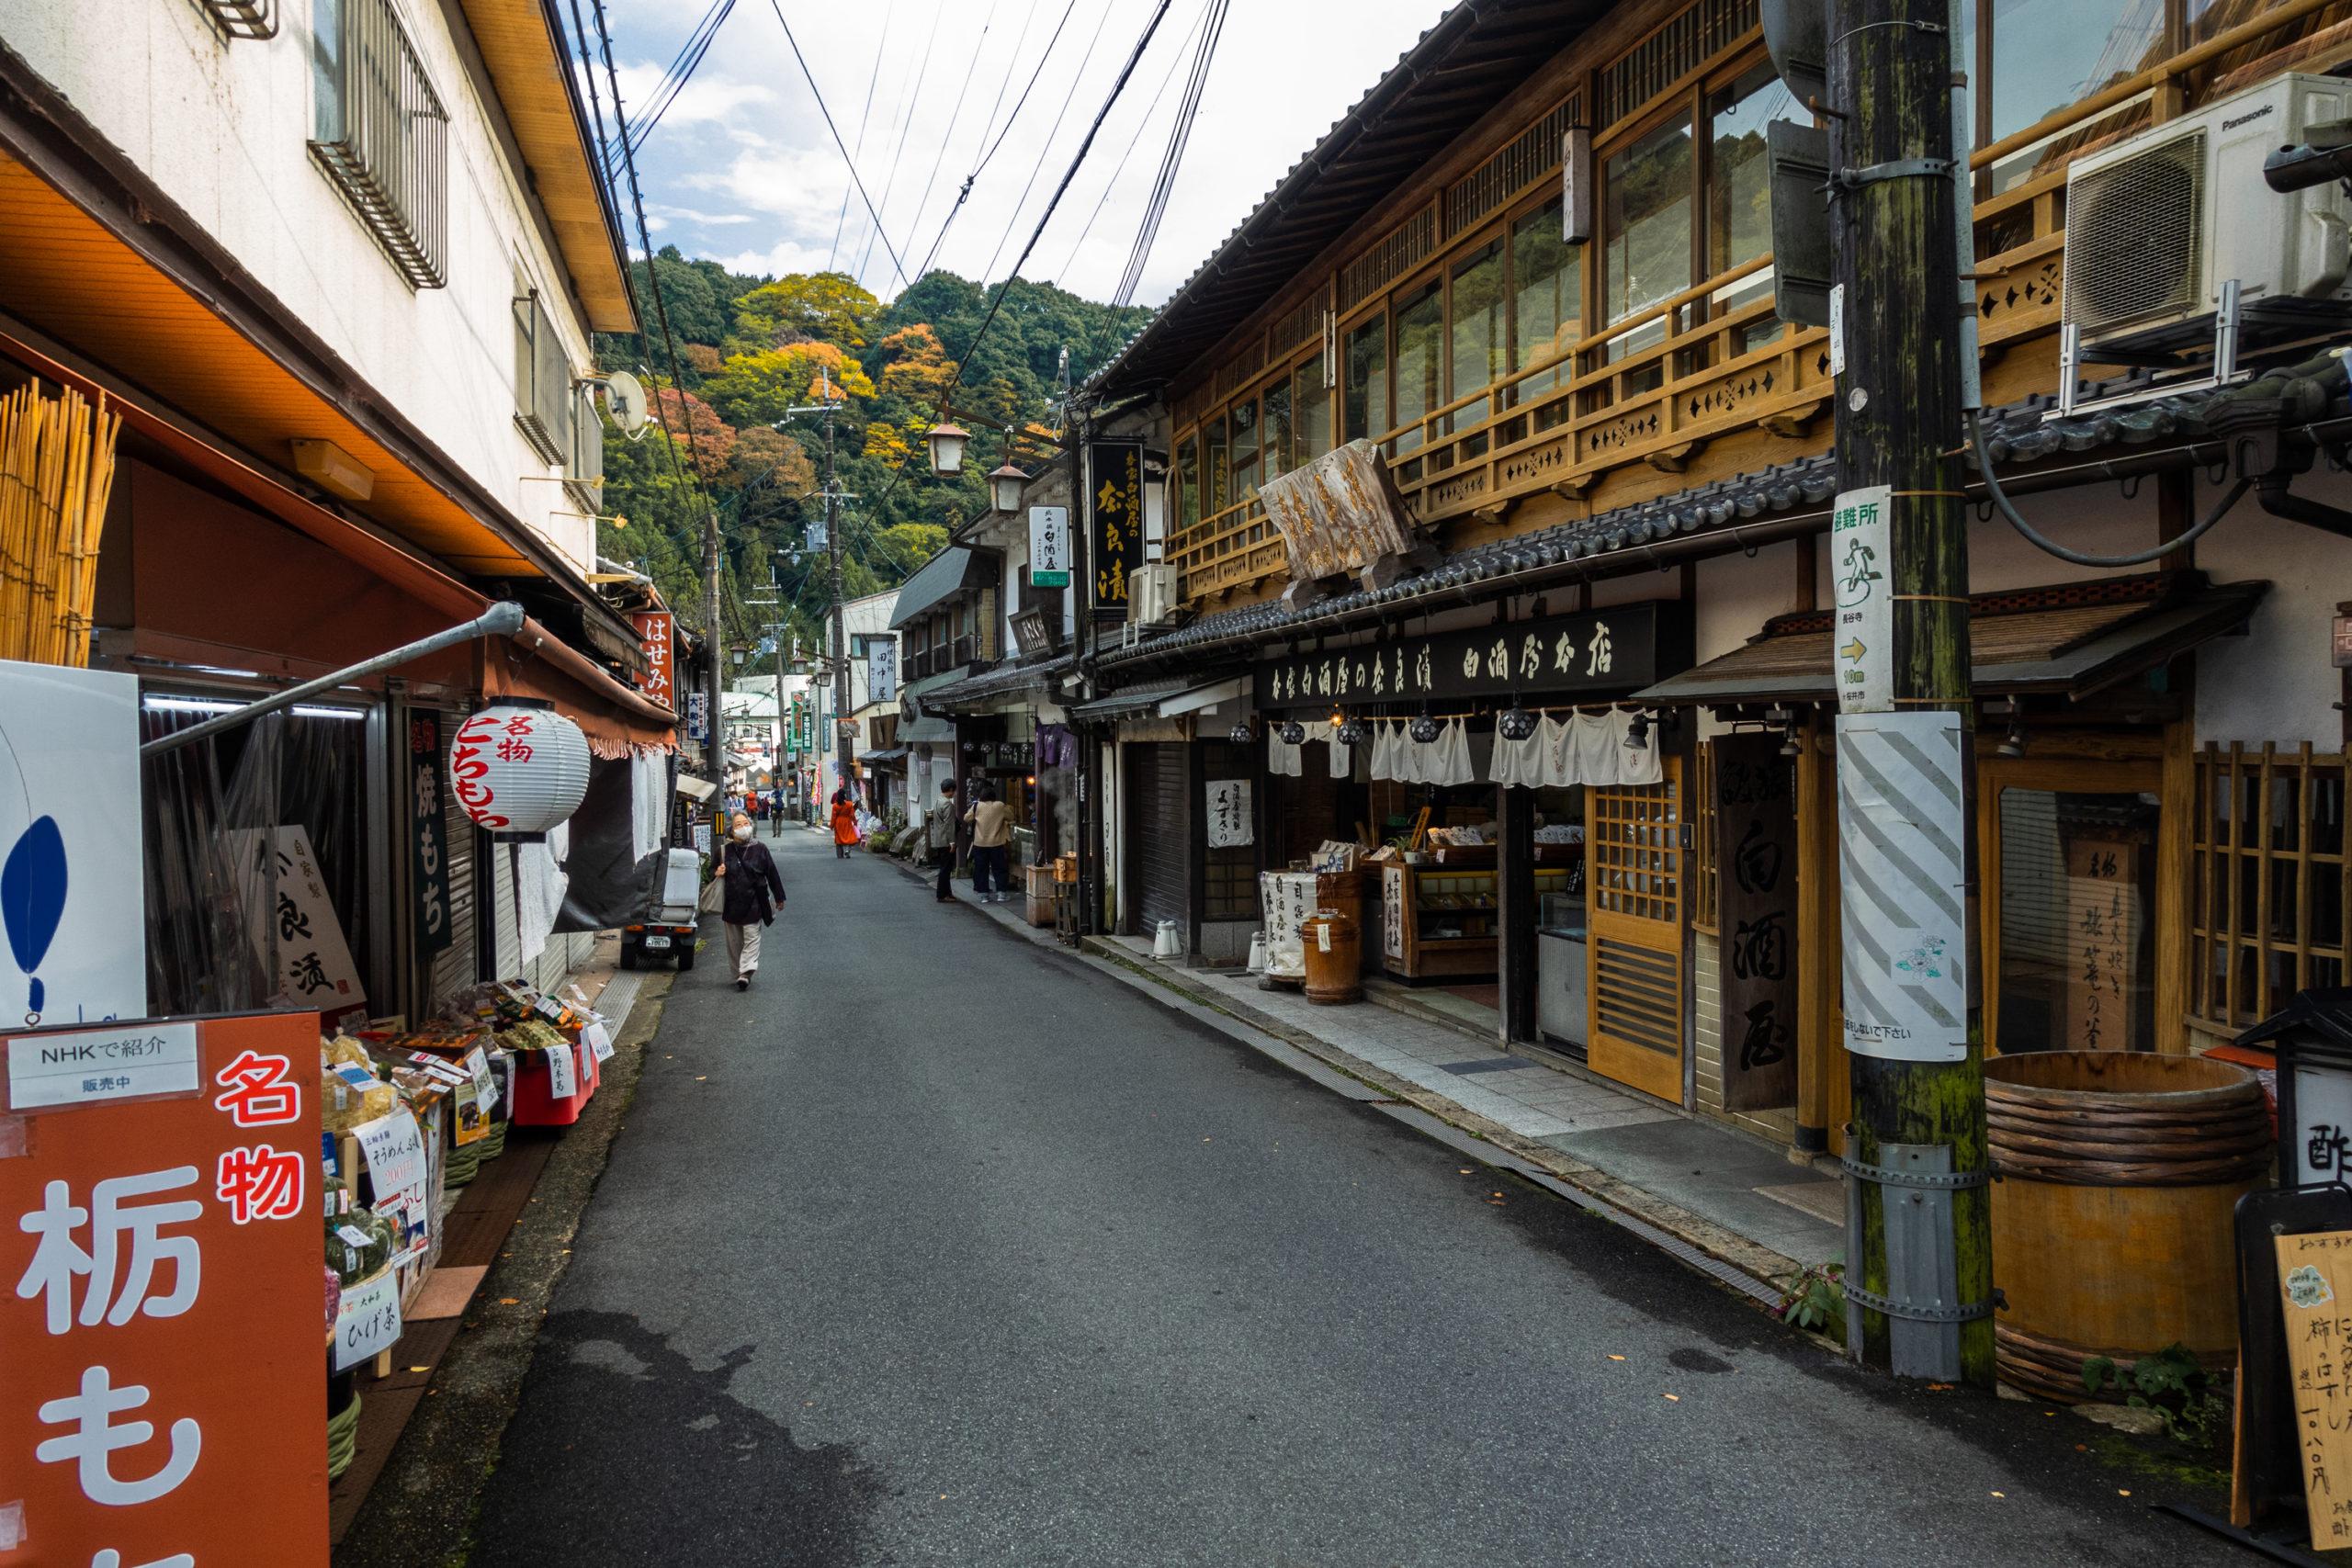 DSC00428-scaled 奈良県  長谷寺(風情を感じる五重塔と紅葉景色が美しい秋のおすすめスポット! 撮影した写真の紹介、アクセス情報や駐車場情報など)